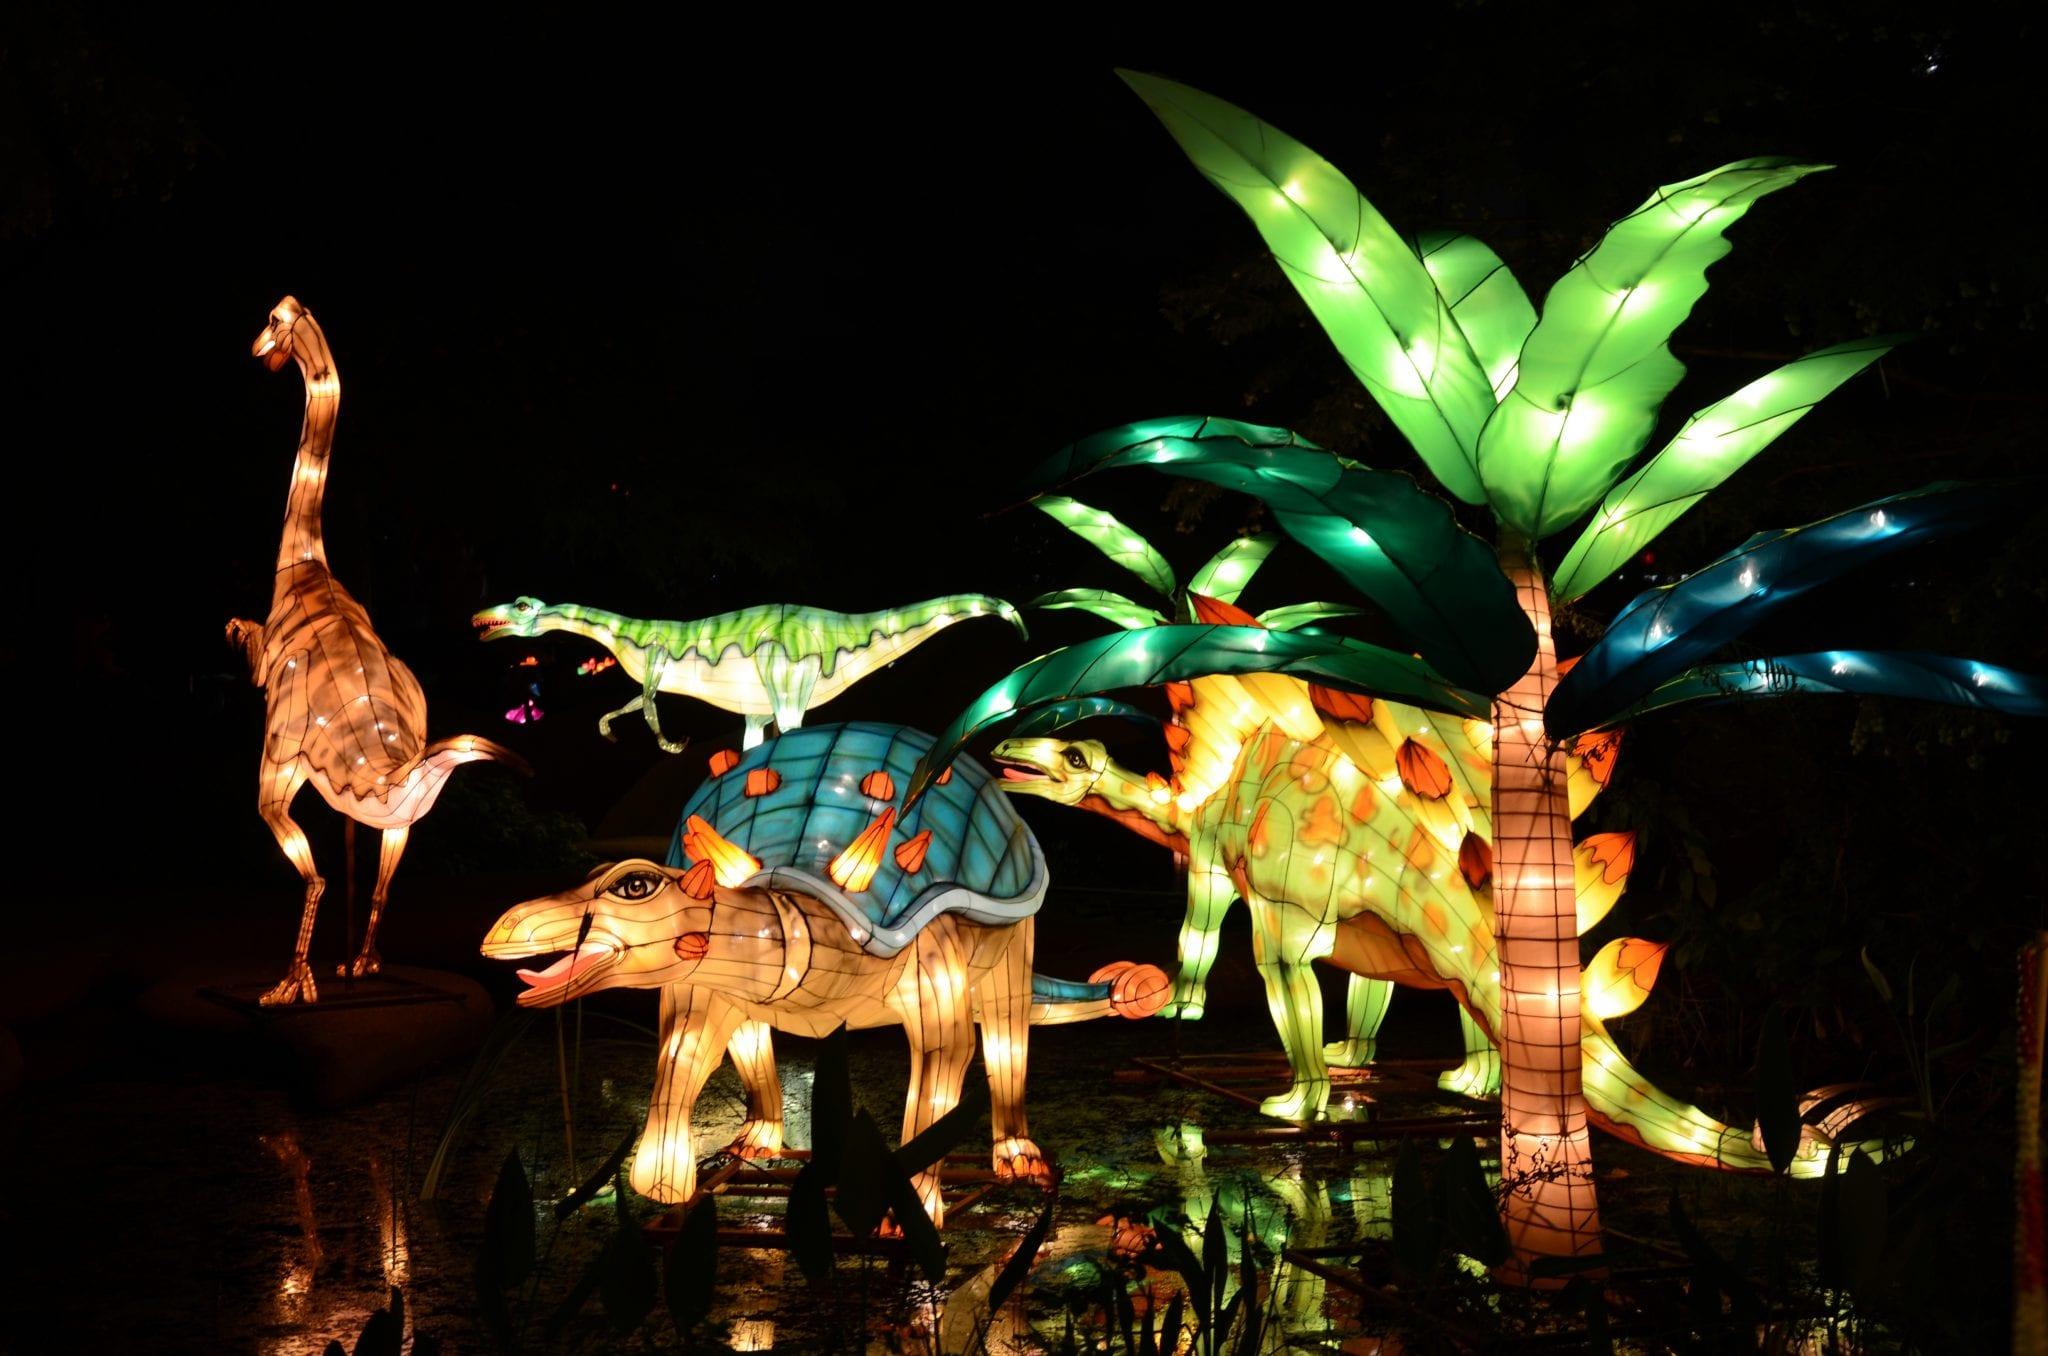 Hanart Chinese Lantern Festival